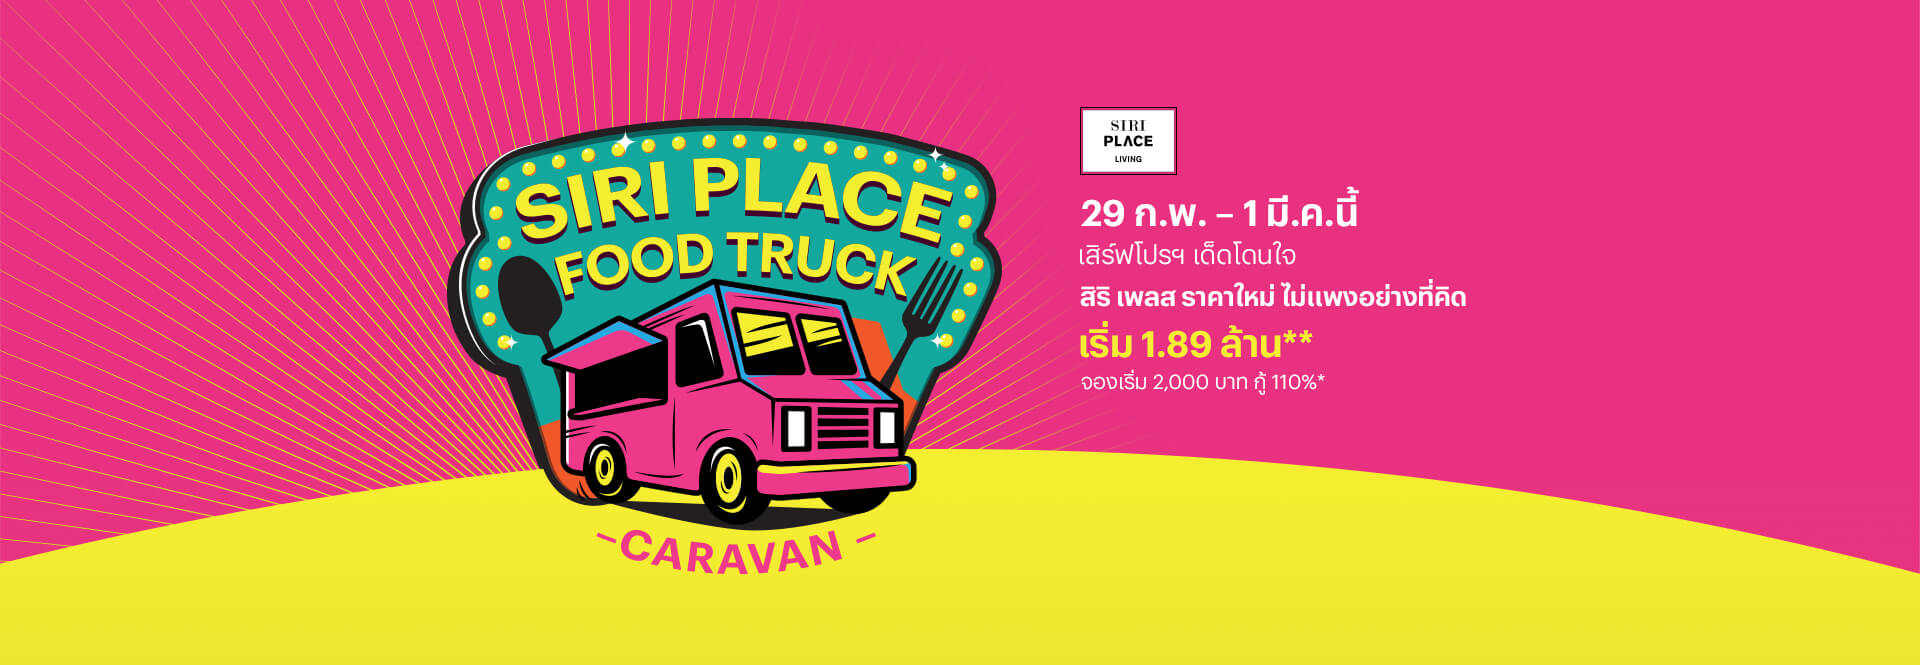 Siri Place Food Truck Caravan